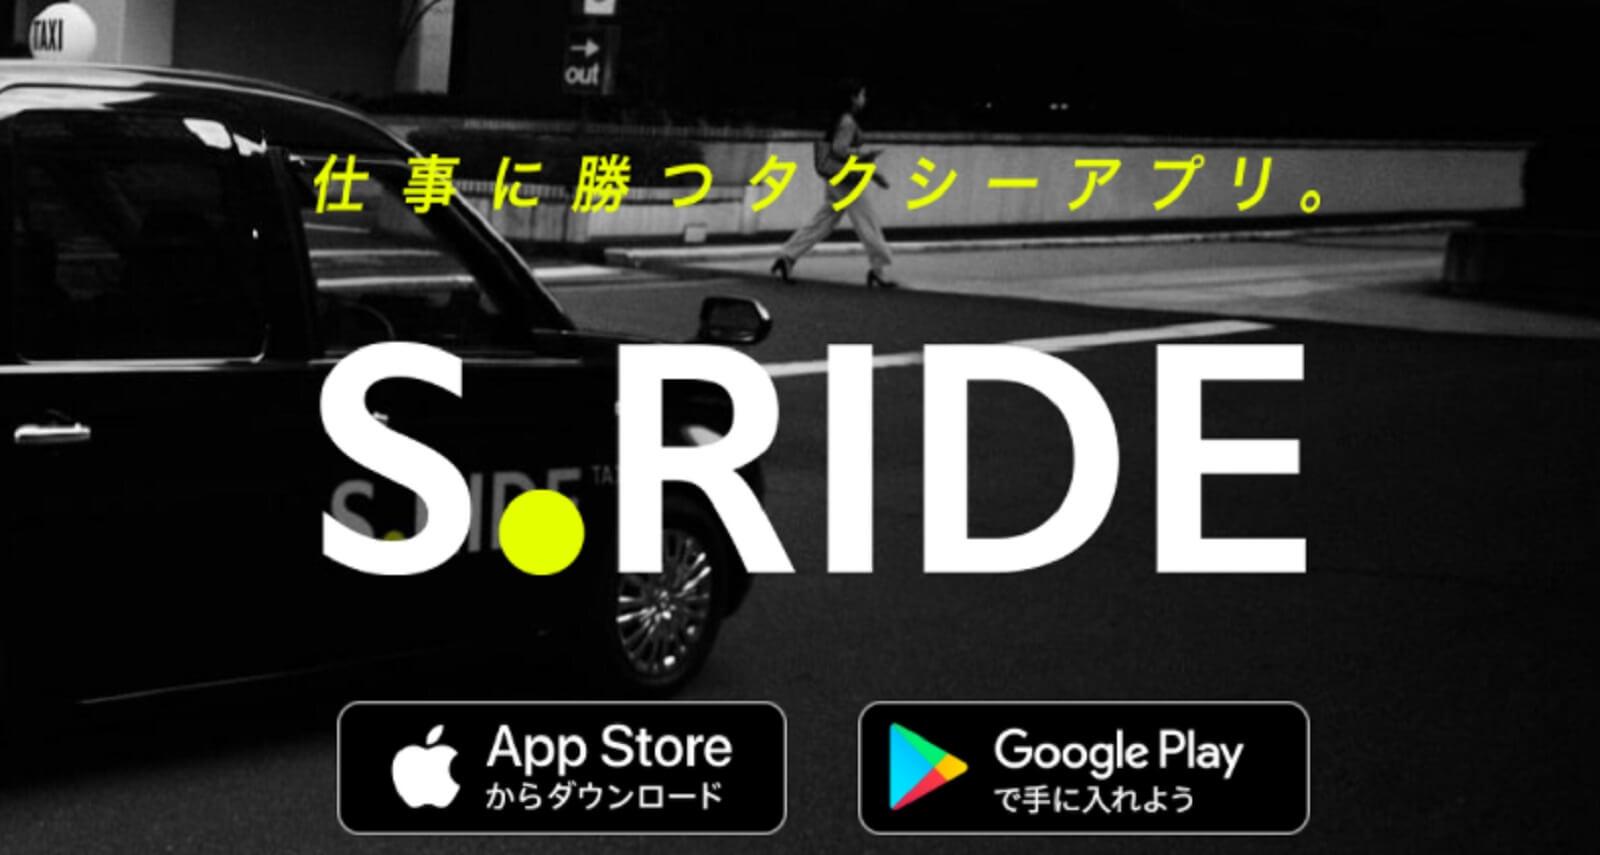 S.RIDE、関東住なら一度は使って欲しいタクシー配車アプリ